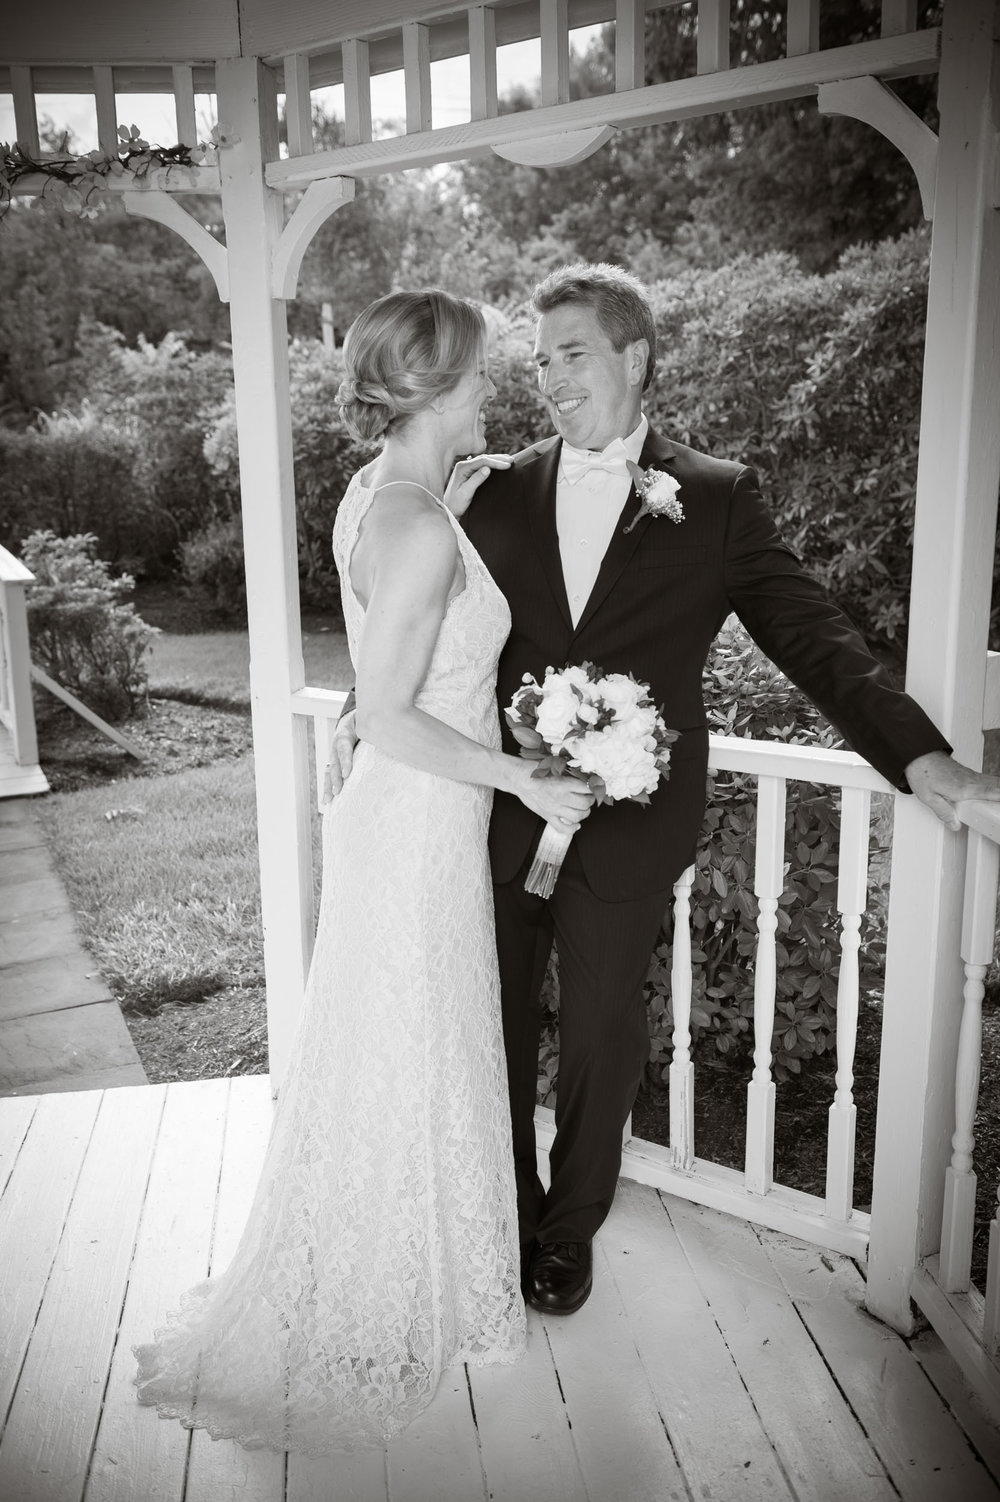 Wedding111PandP 153*1-2.jpg